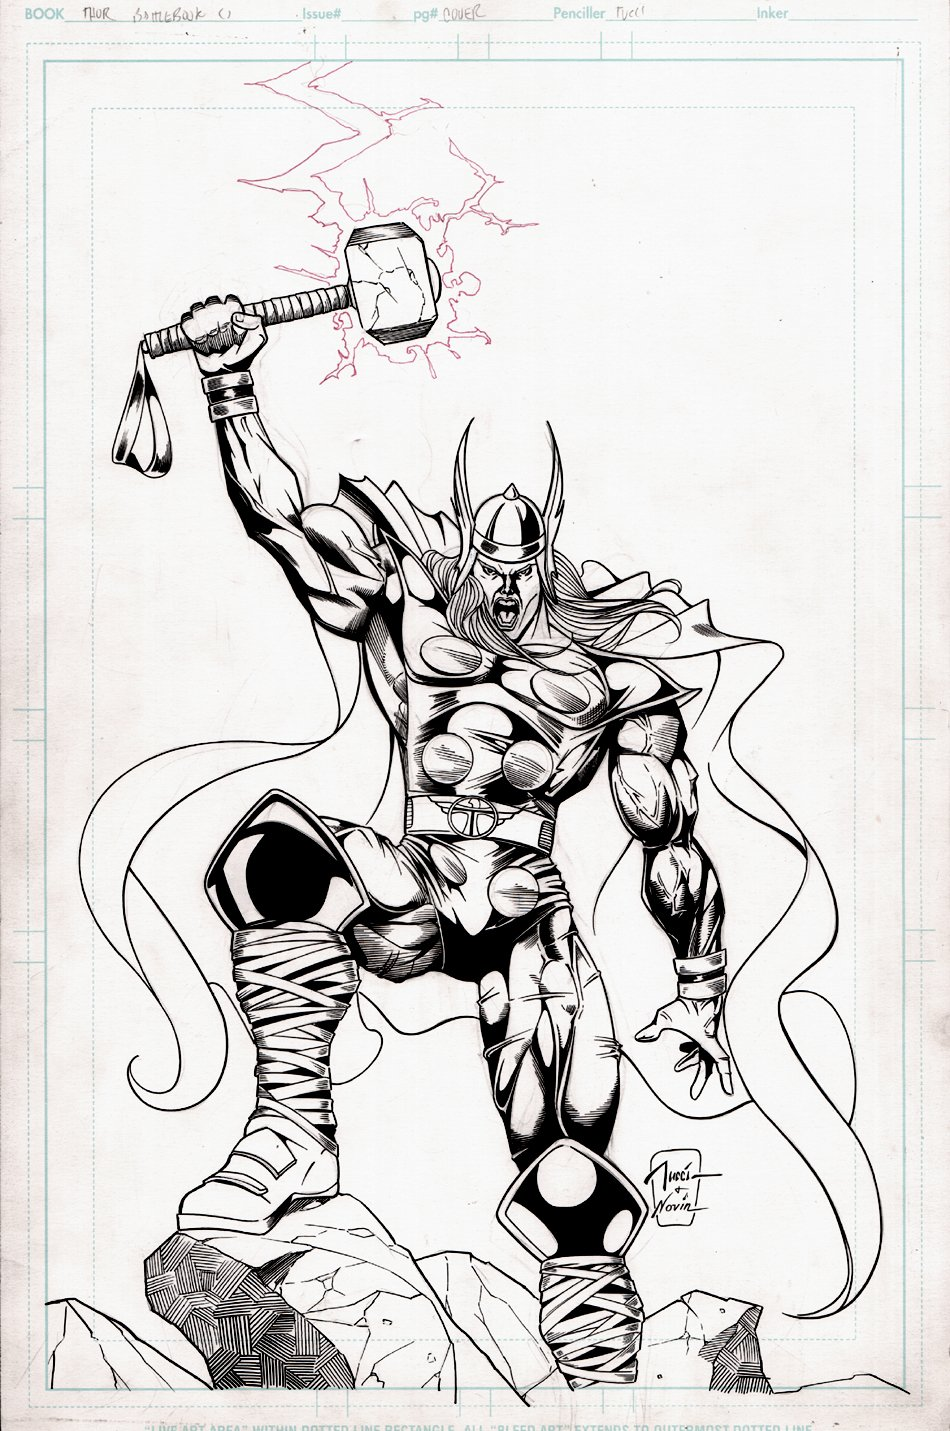 Thor Battlebooks #1 Cover (1998)